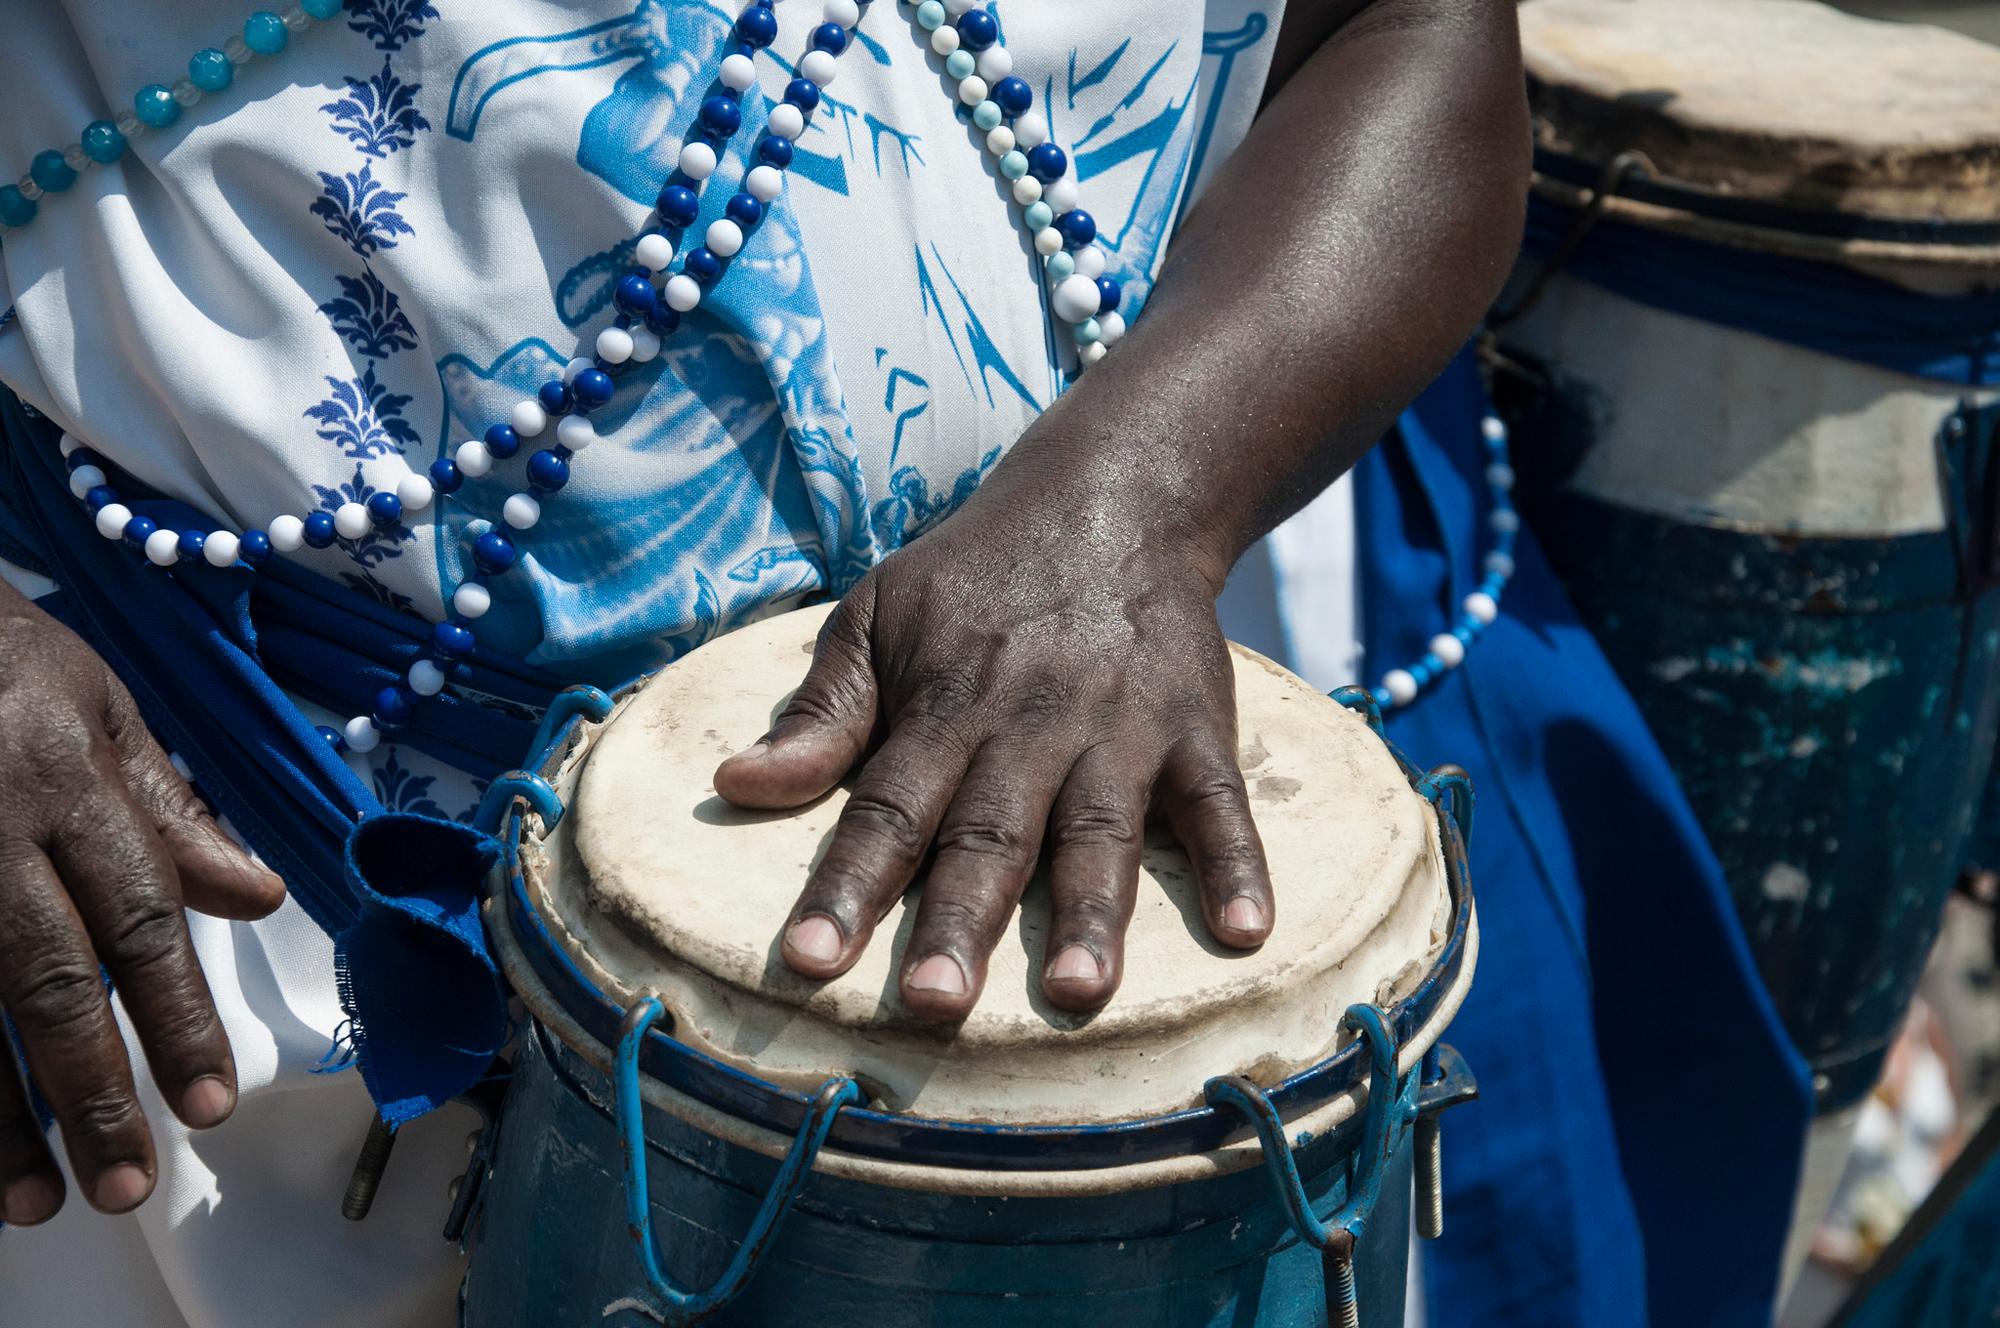 A Brazilian drummer playing for Orisha Iemanjá (Yor.Yemọja), photo  Midía Ninja CC  BY-SA 2.0